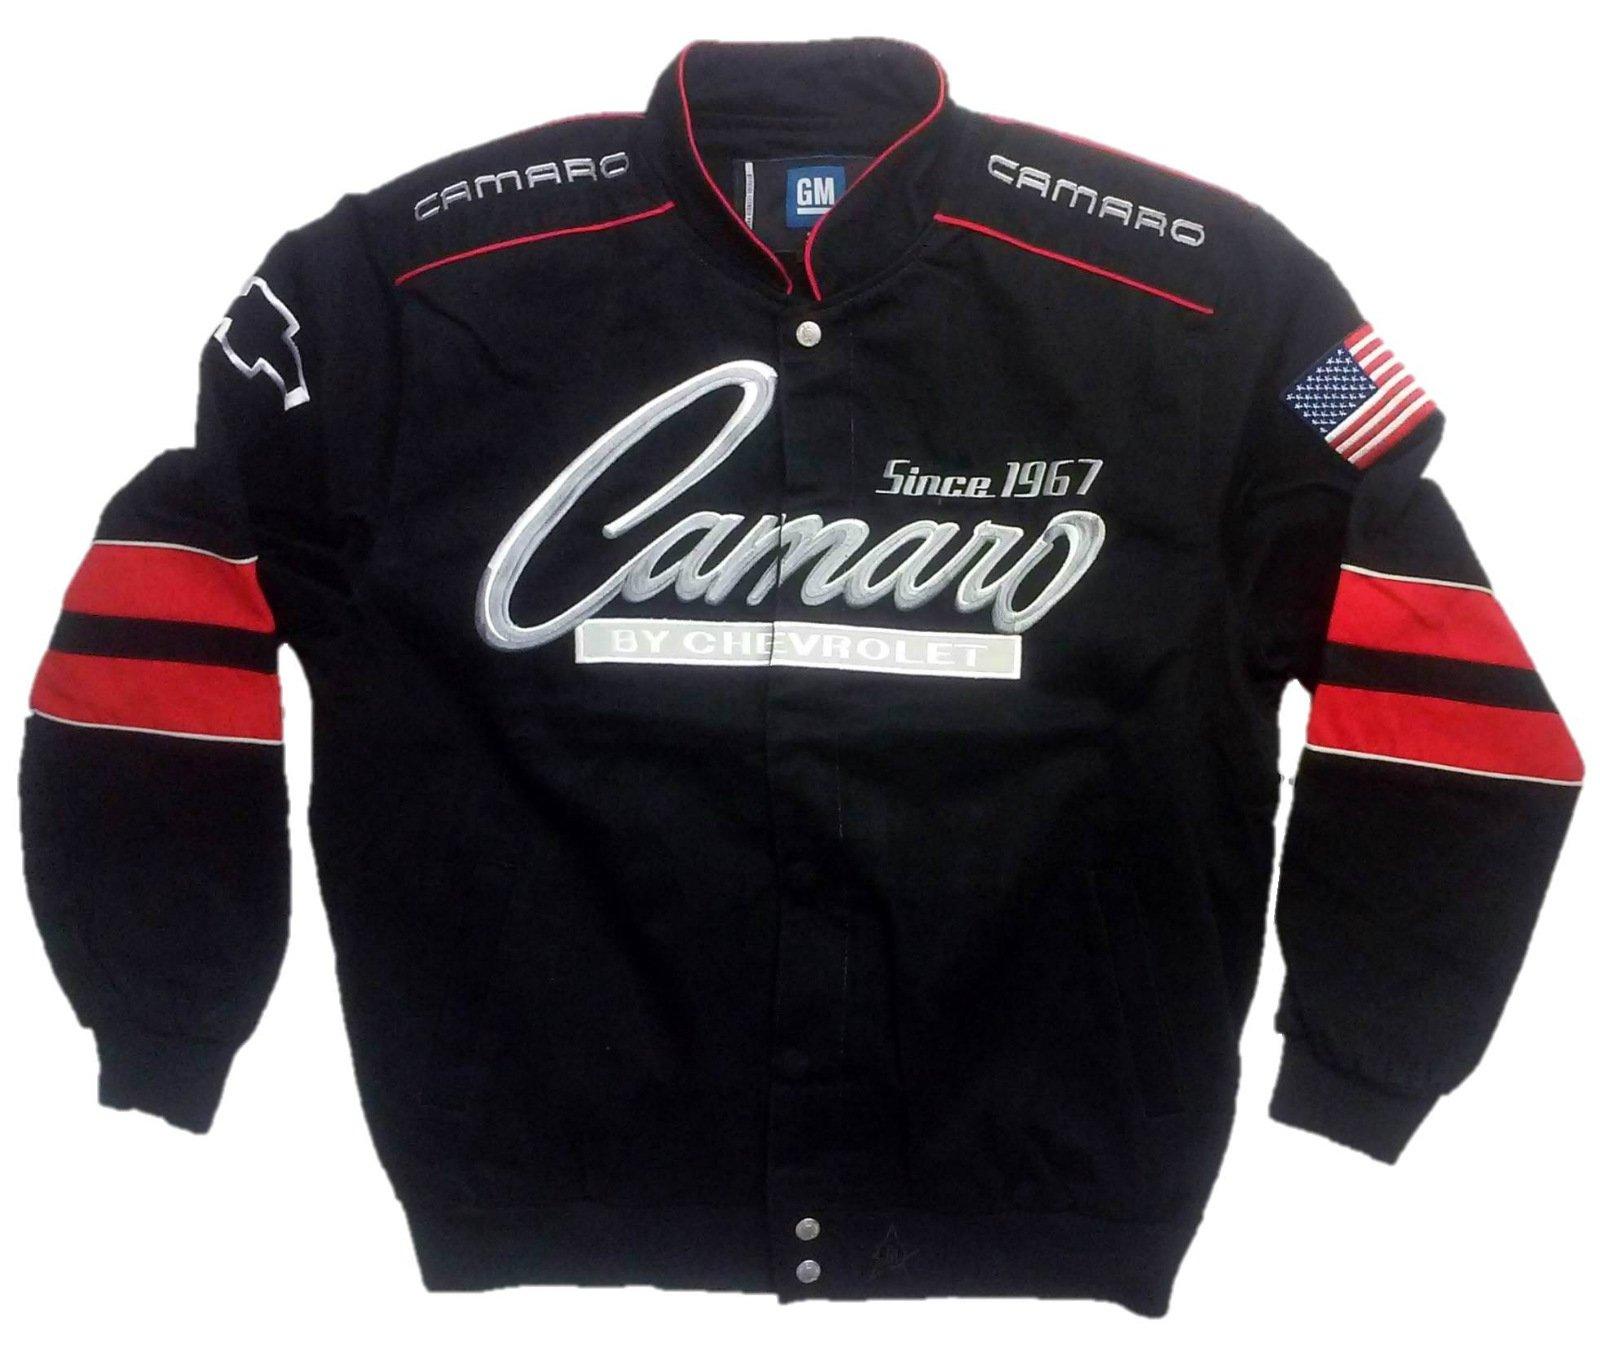 J.H. Design JH Design Chevy Camaro Cotton Twill Jacket, XXX-Large, Black